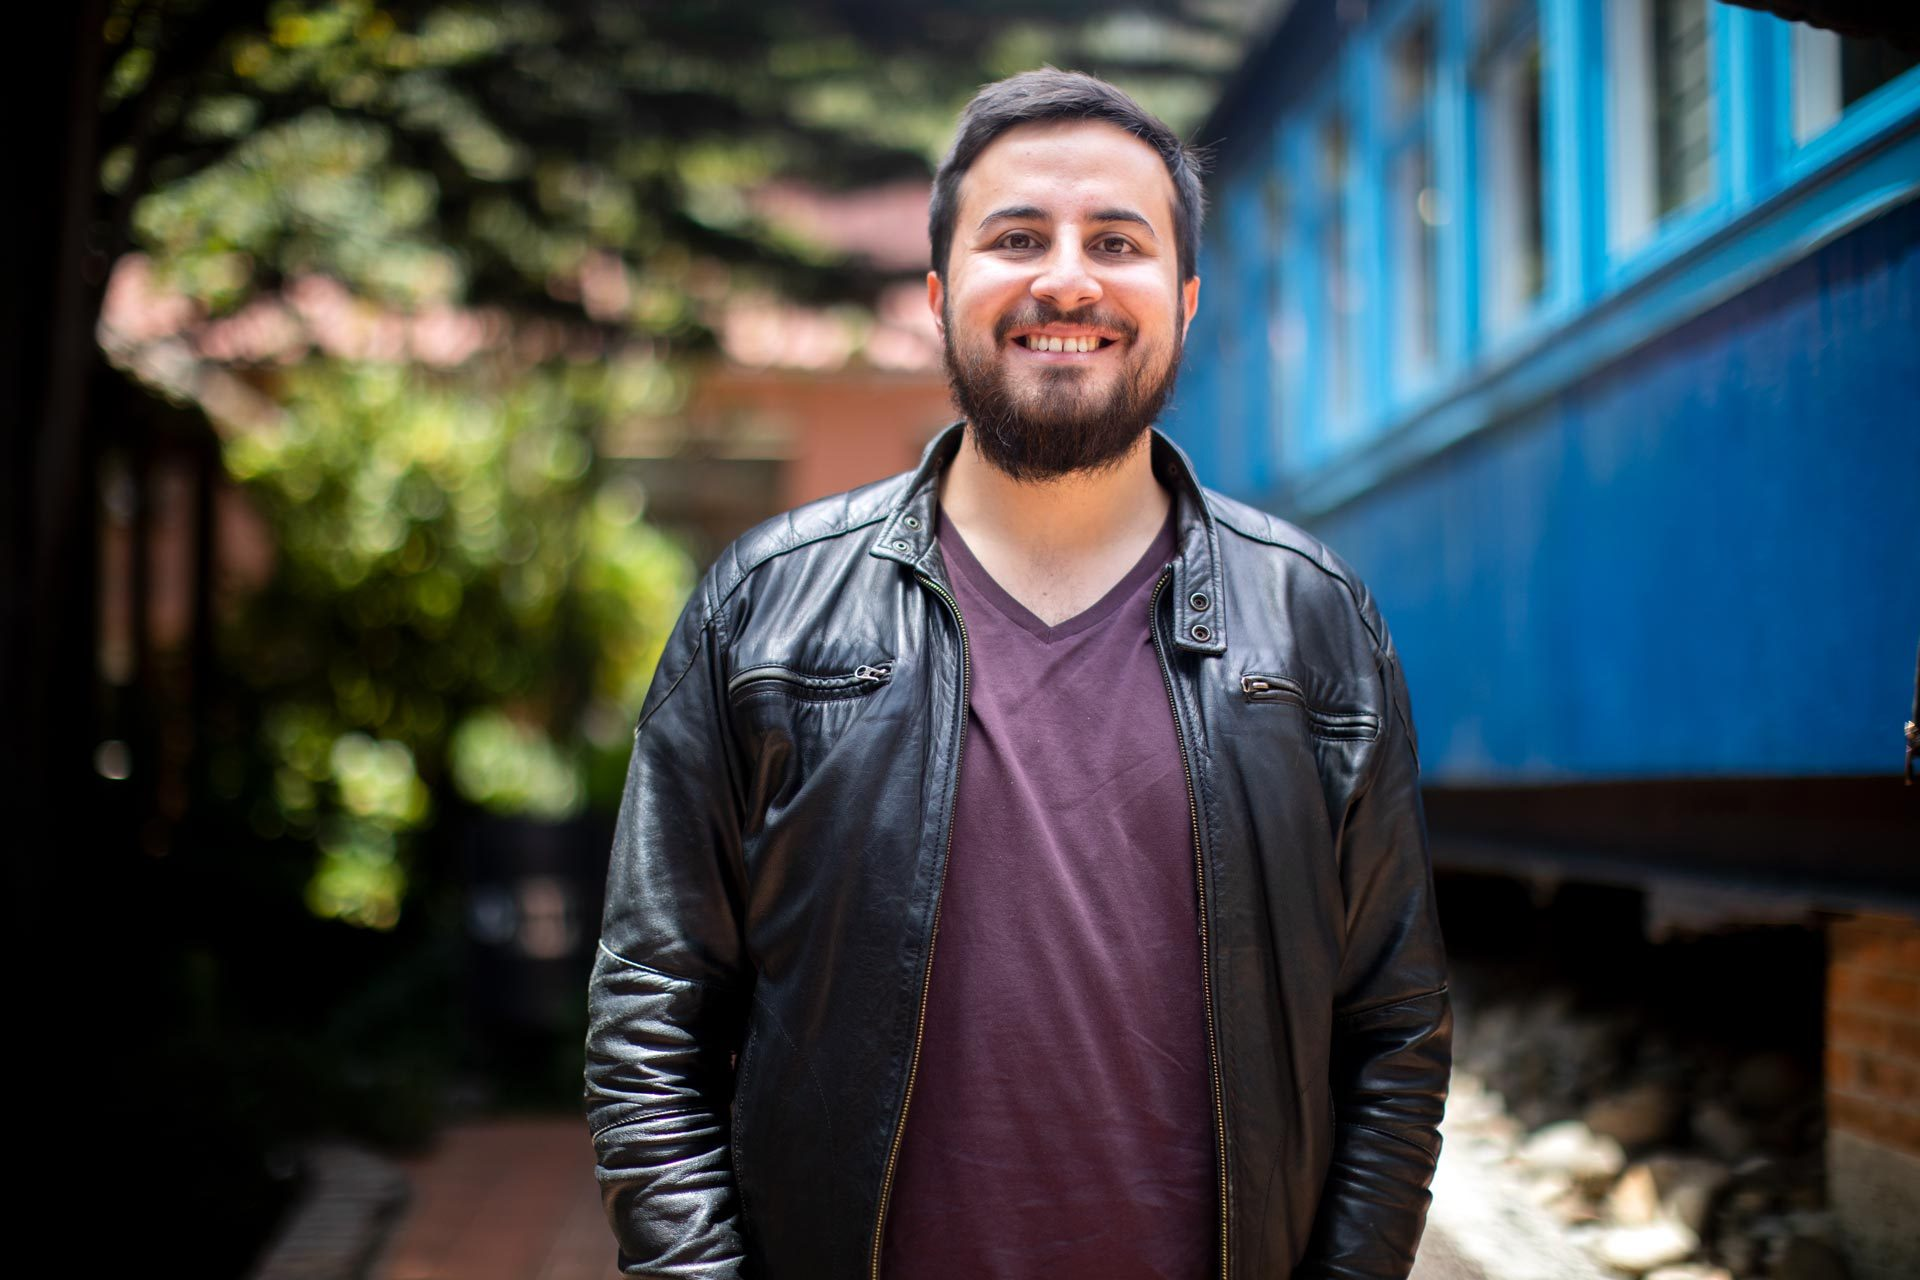 Sebastián Payán frente a los vagones azules de Cerosetenta